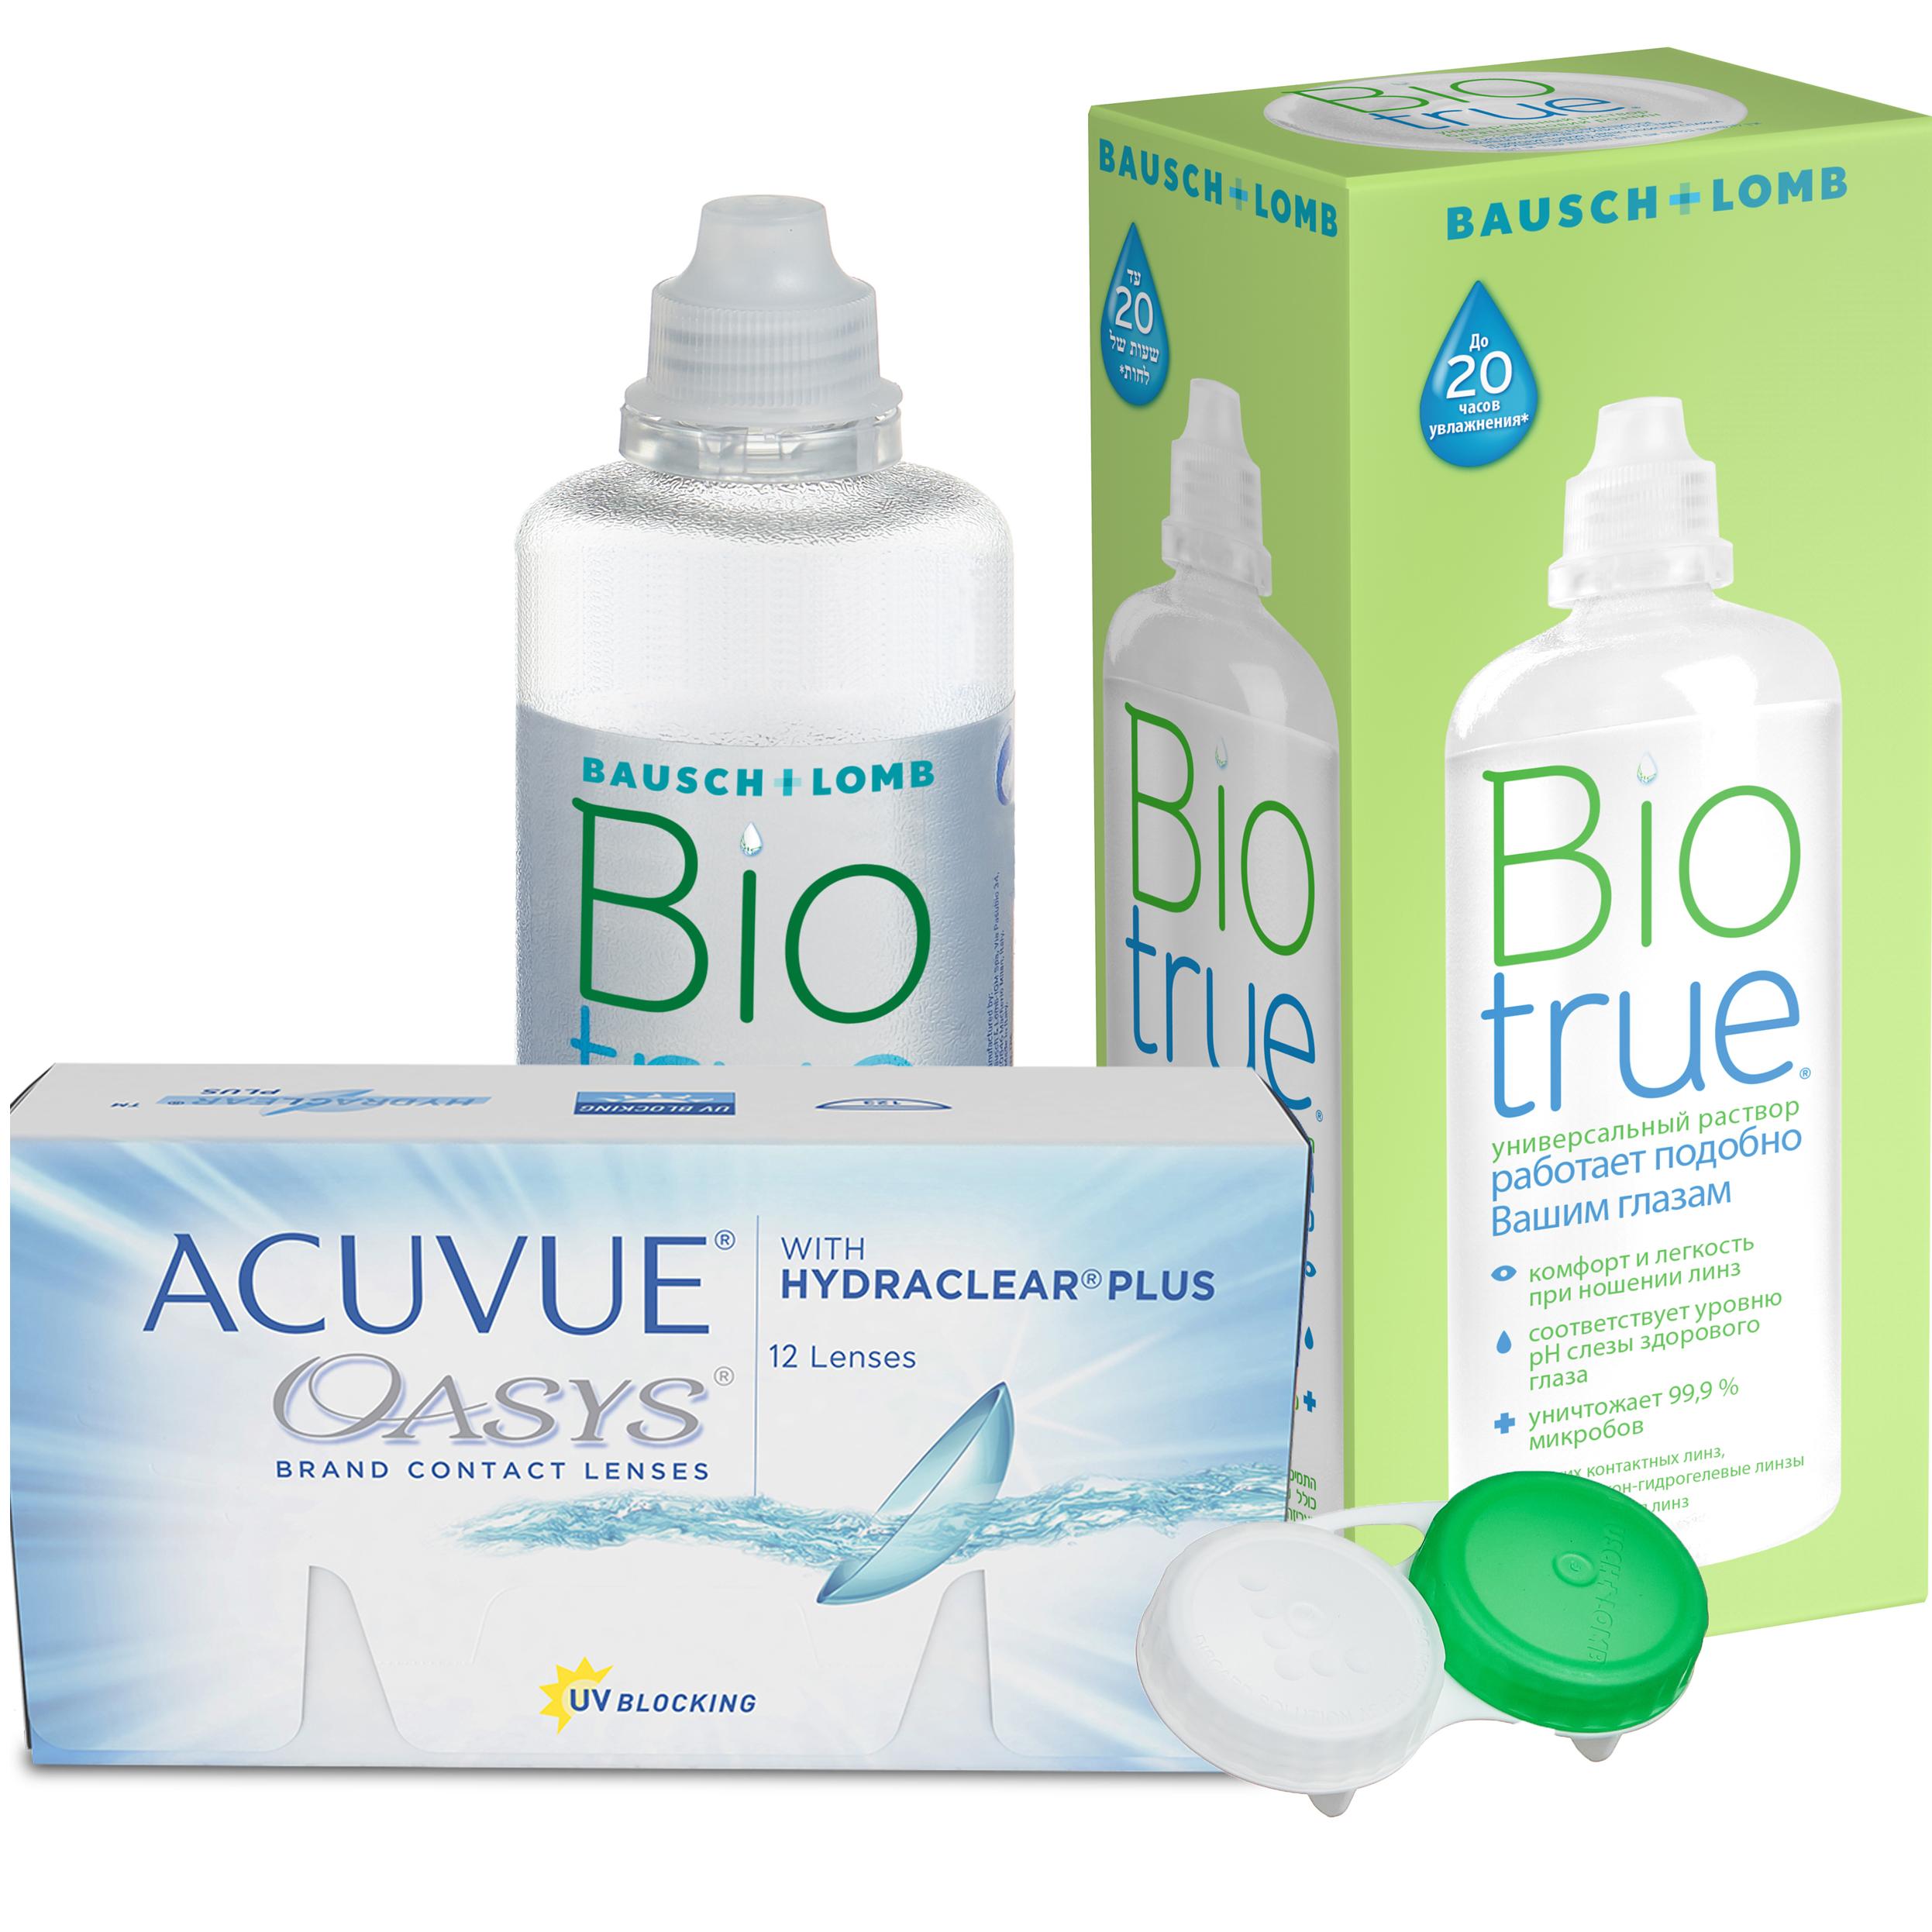 Купить Oasys with Hydraclear Plus 12 линз + Biotrue, Контактные линзы Acuvue Oasys with Hydraclear Plus 12 линз R 8.4 -5, 50 + Biotrue 300 мл